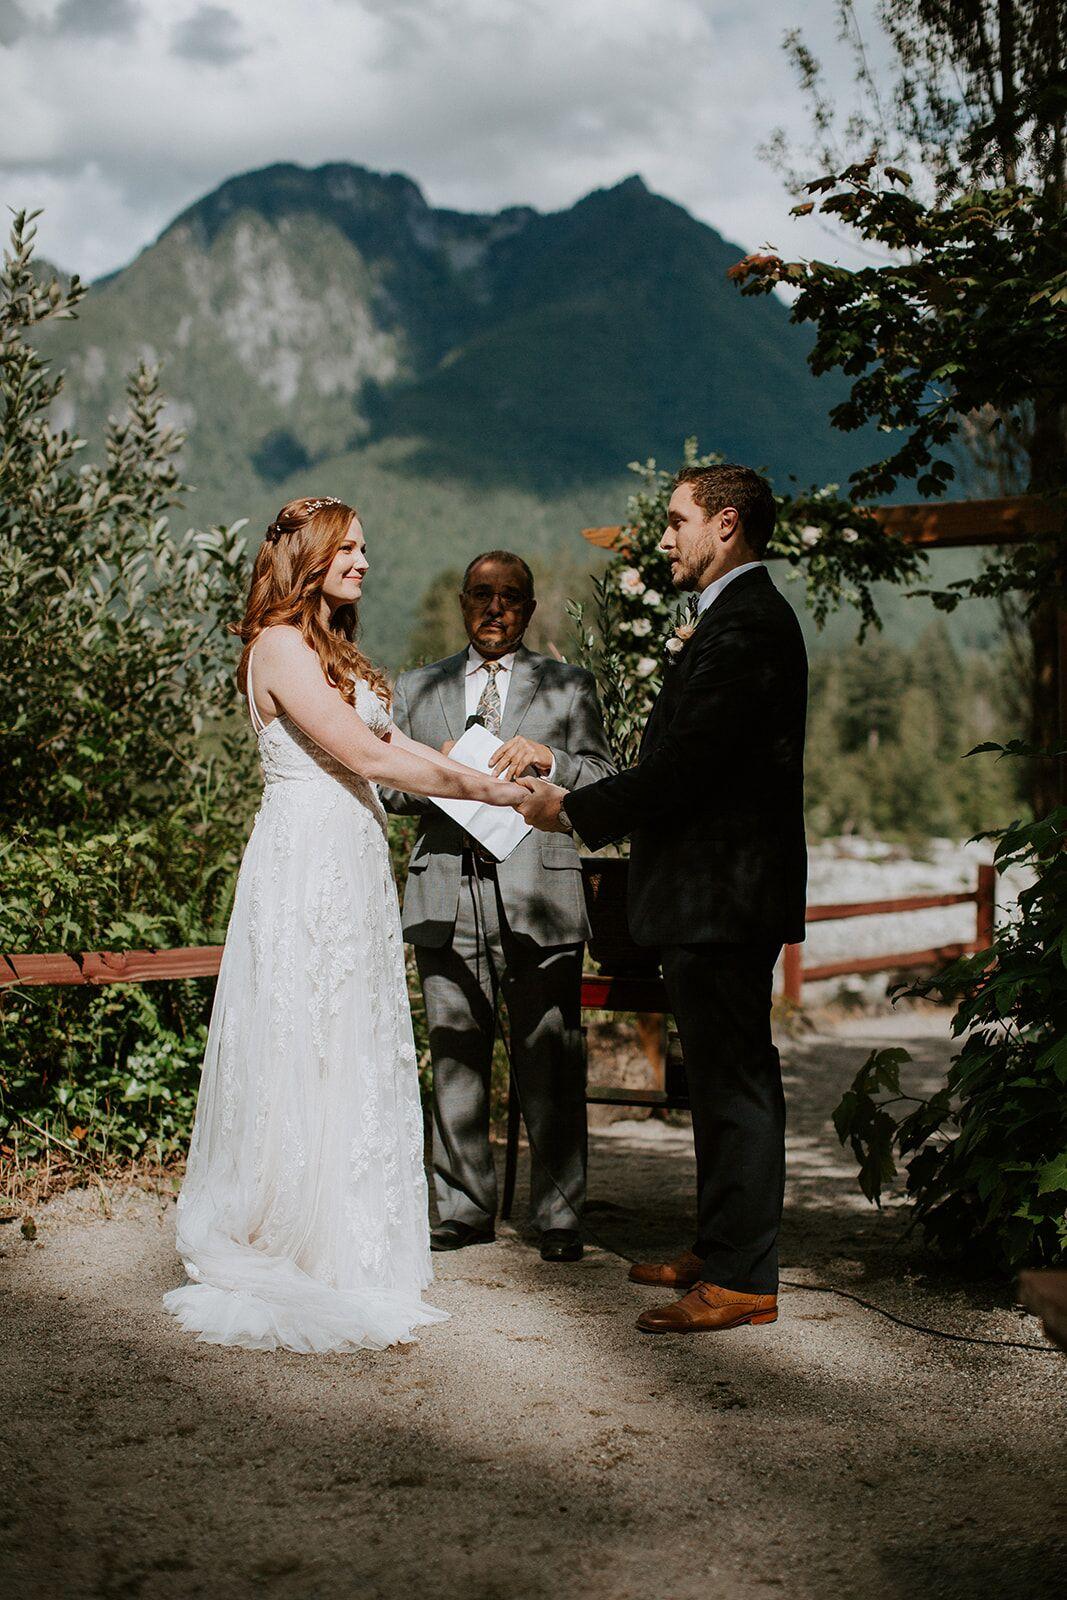 Blue-Sky-Ranch-Wedding-Block-Weddings-and-Events17.jpeg